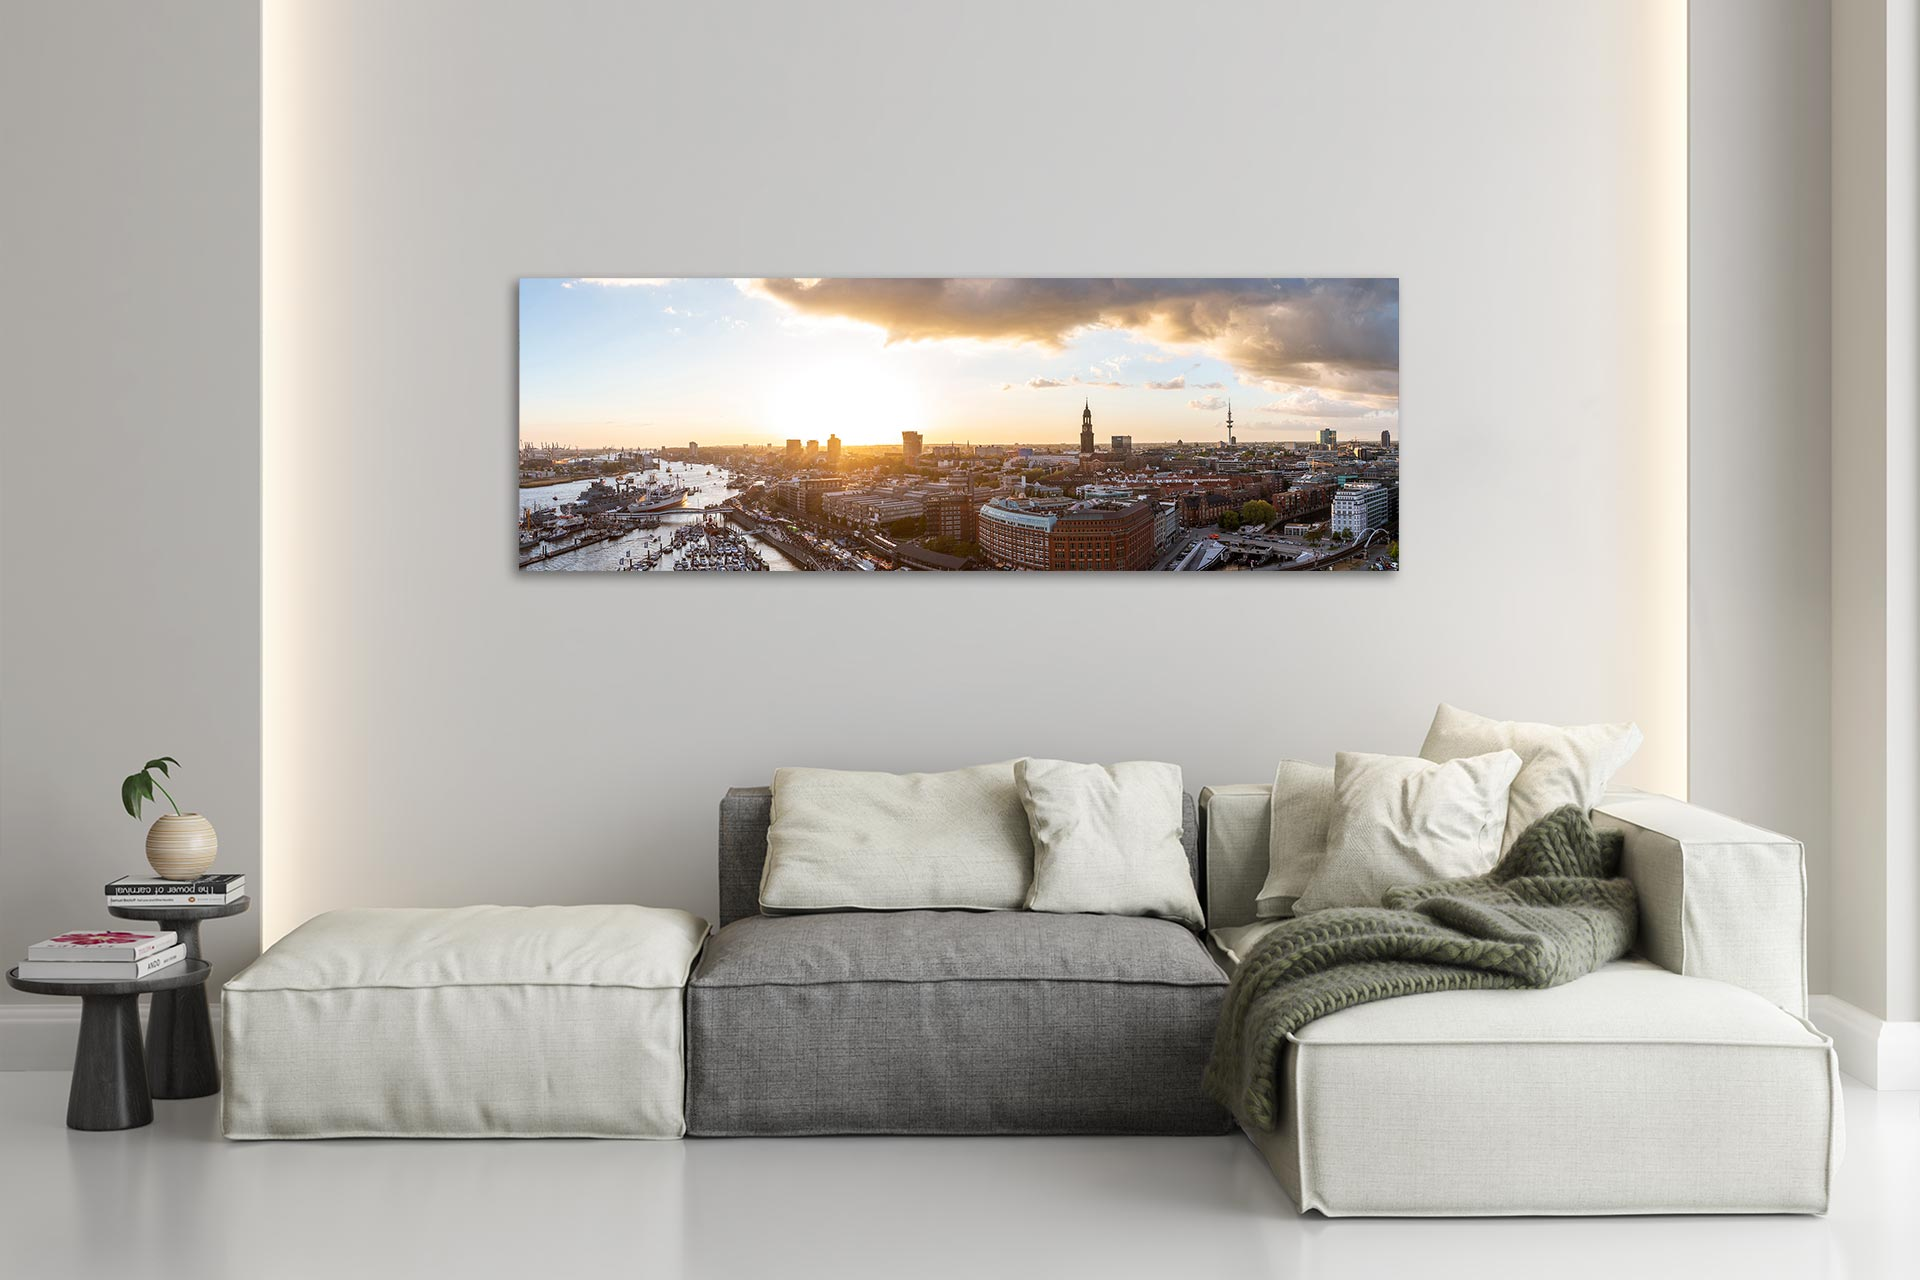 JS306-panorama-hafen-wandbild-auf-leinwand-acrylglas-aludibond-wohnzimmer